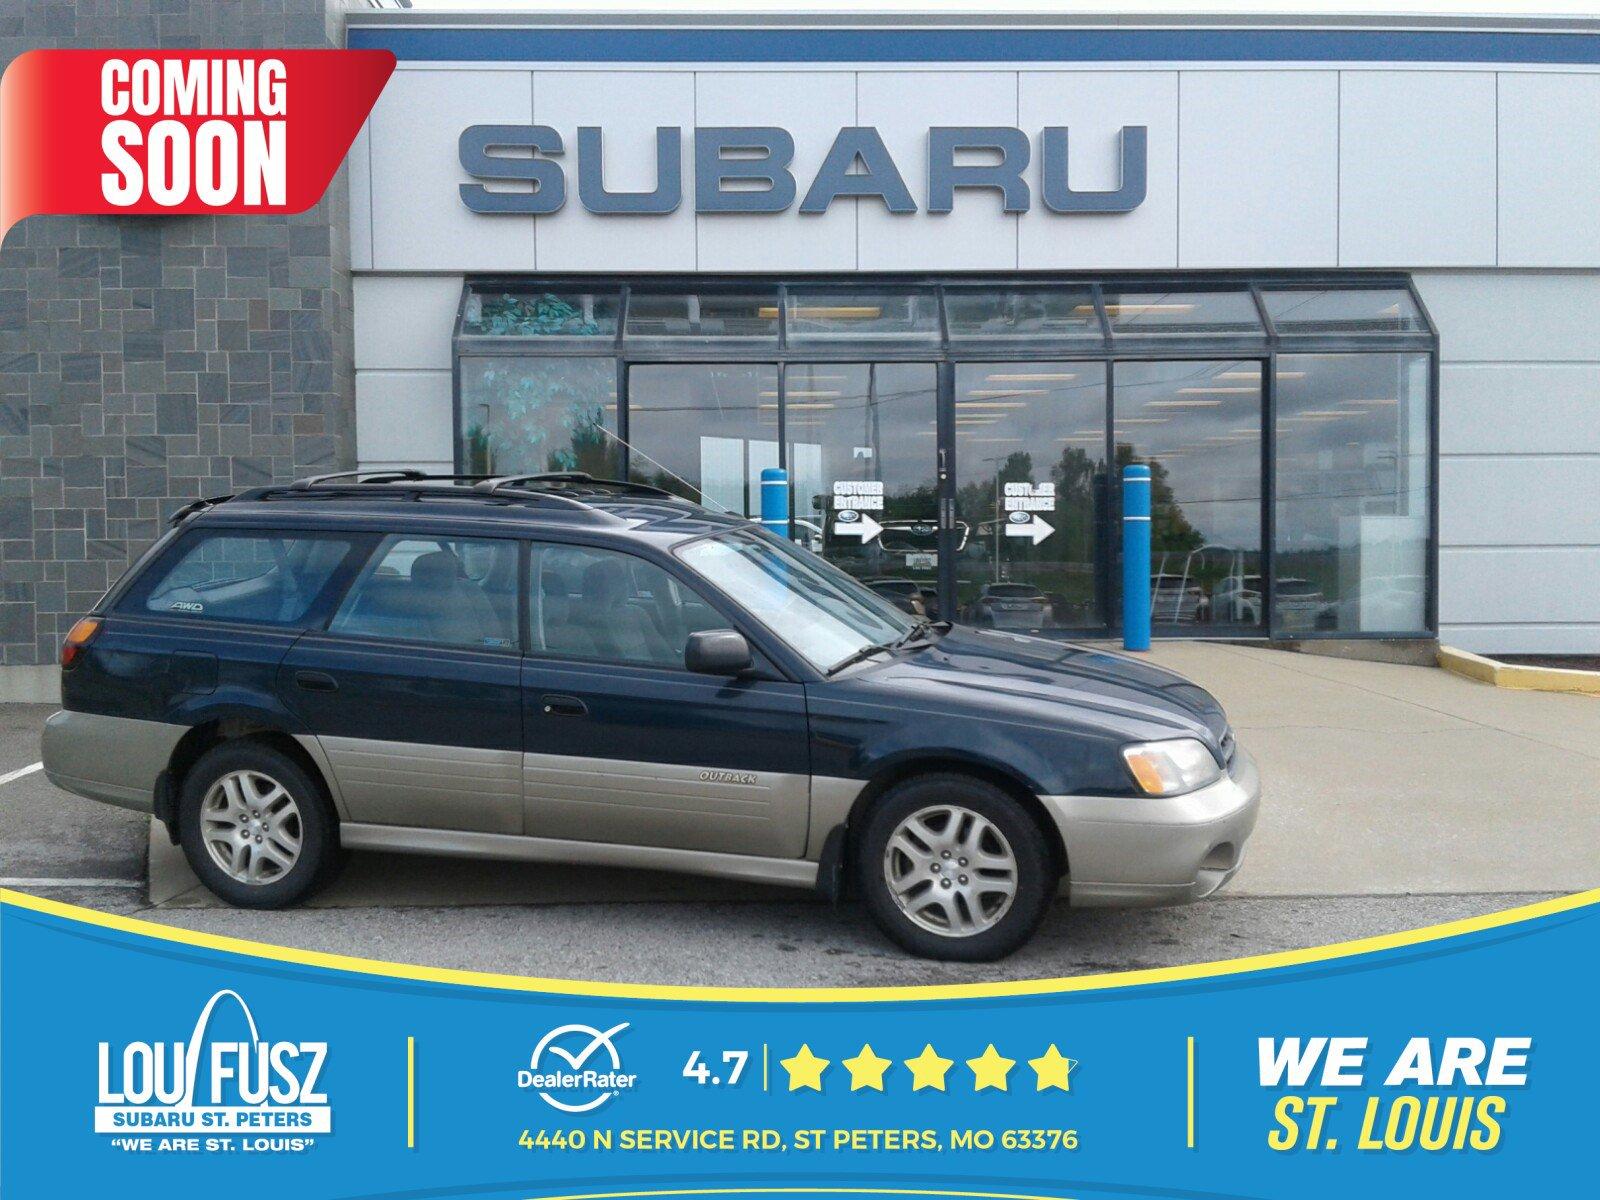 2000 Subaru Legacy Wagon Outback w/RB Equip